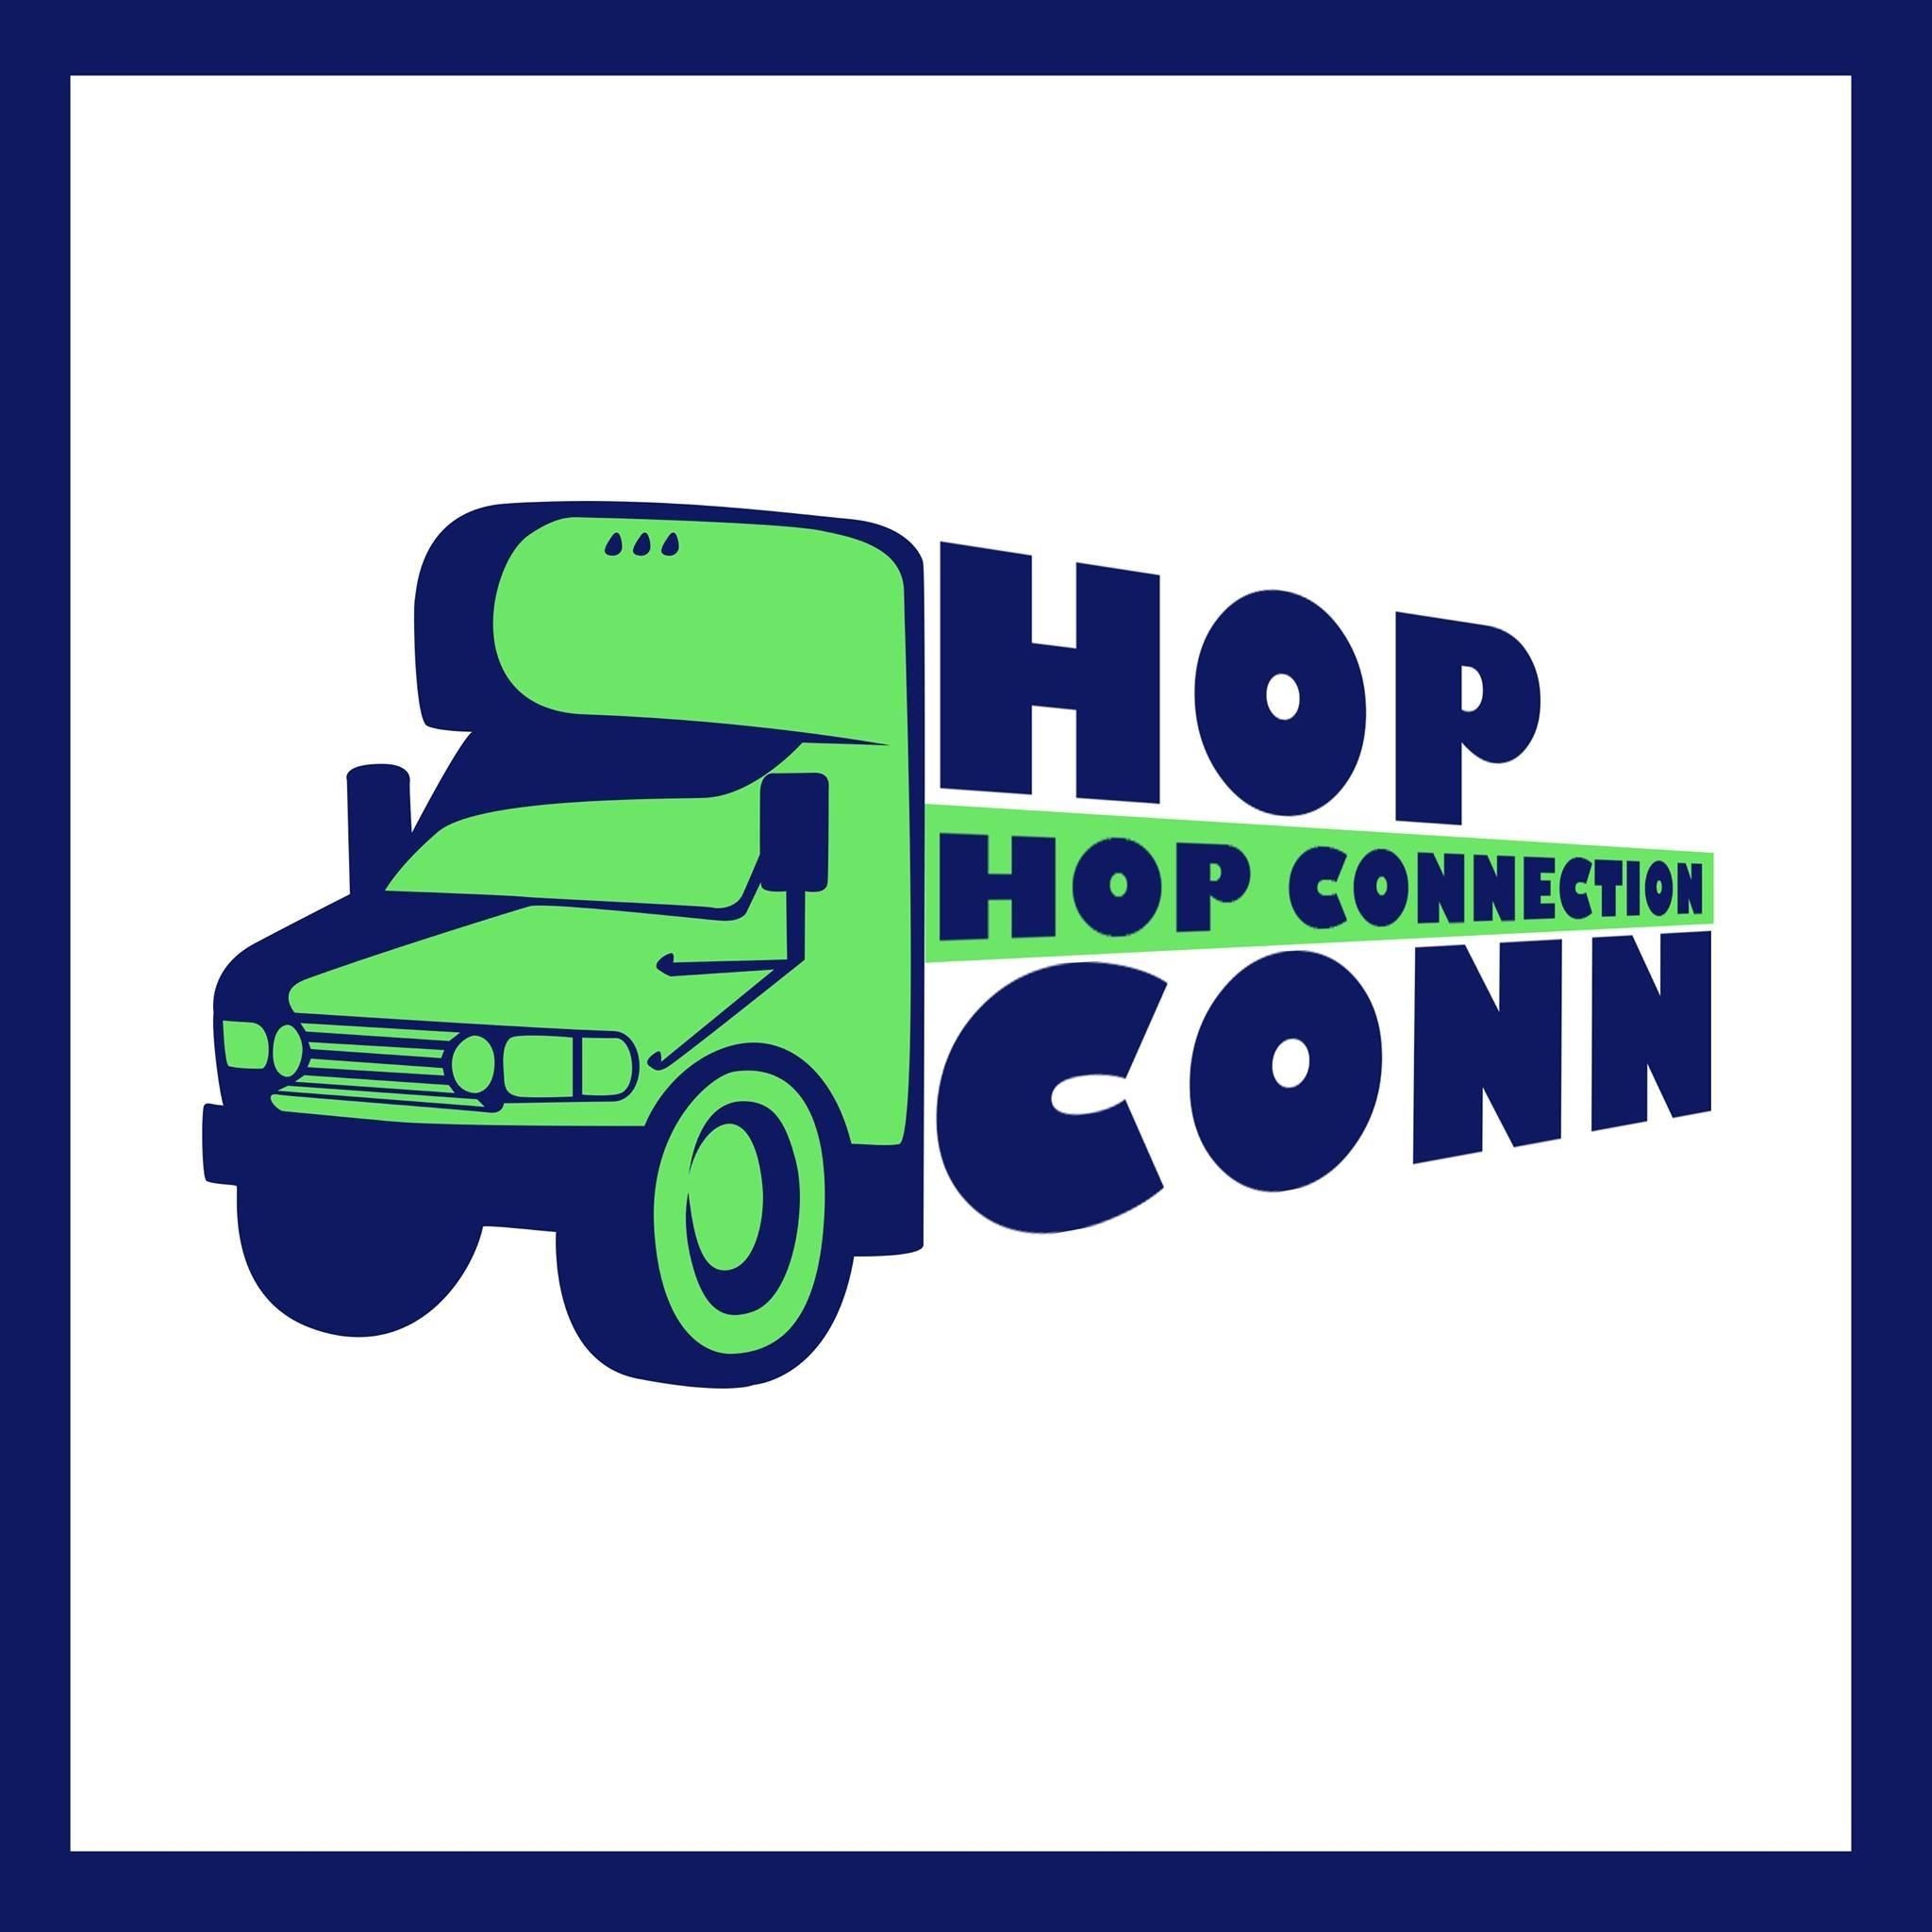 hop conn brew bus.jpg